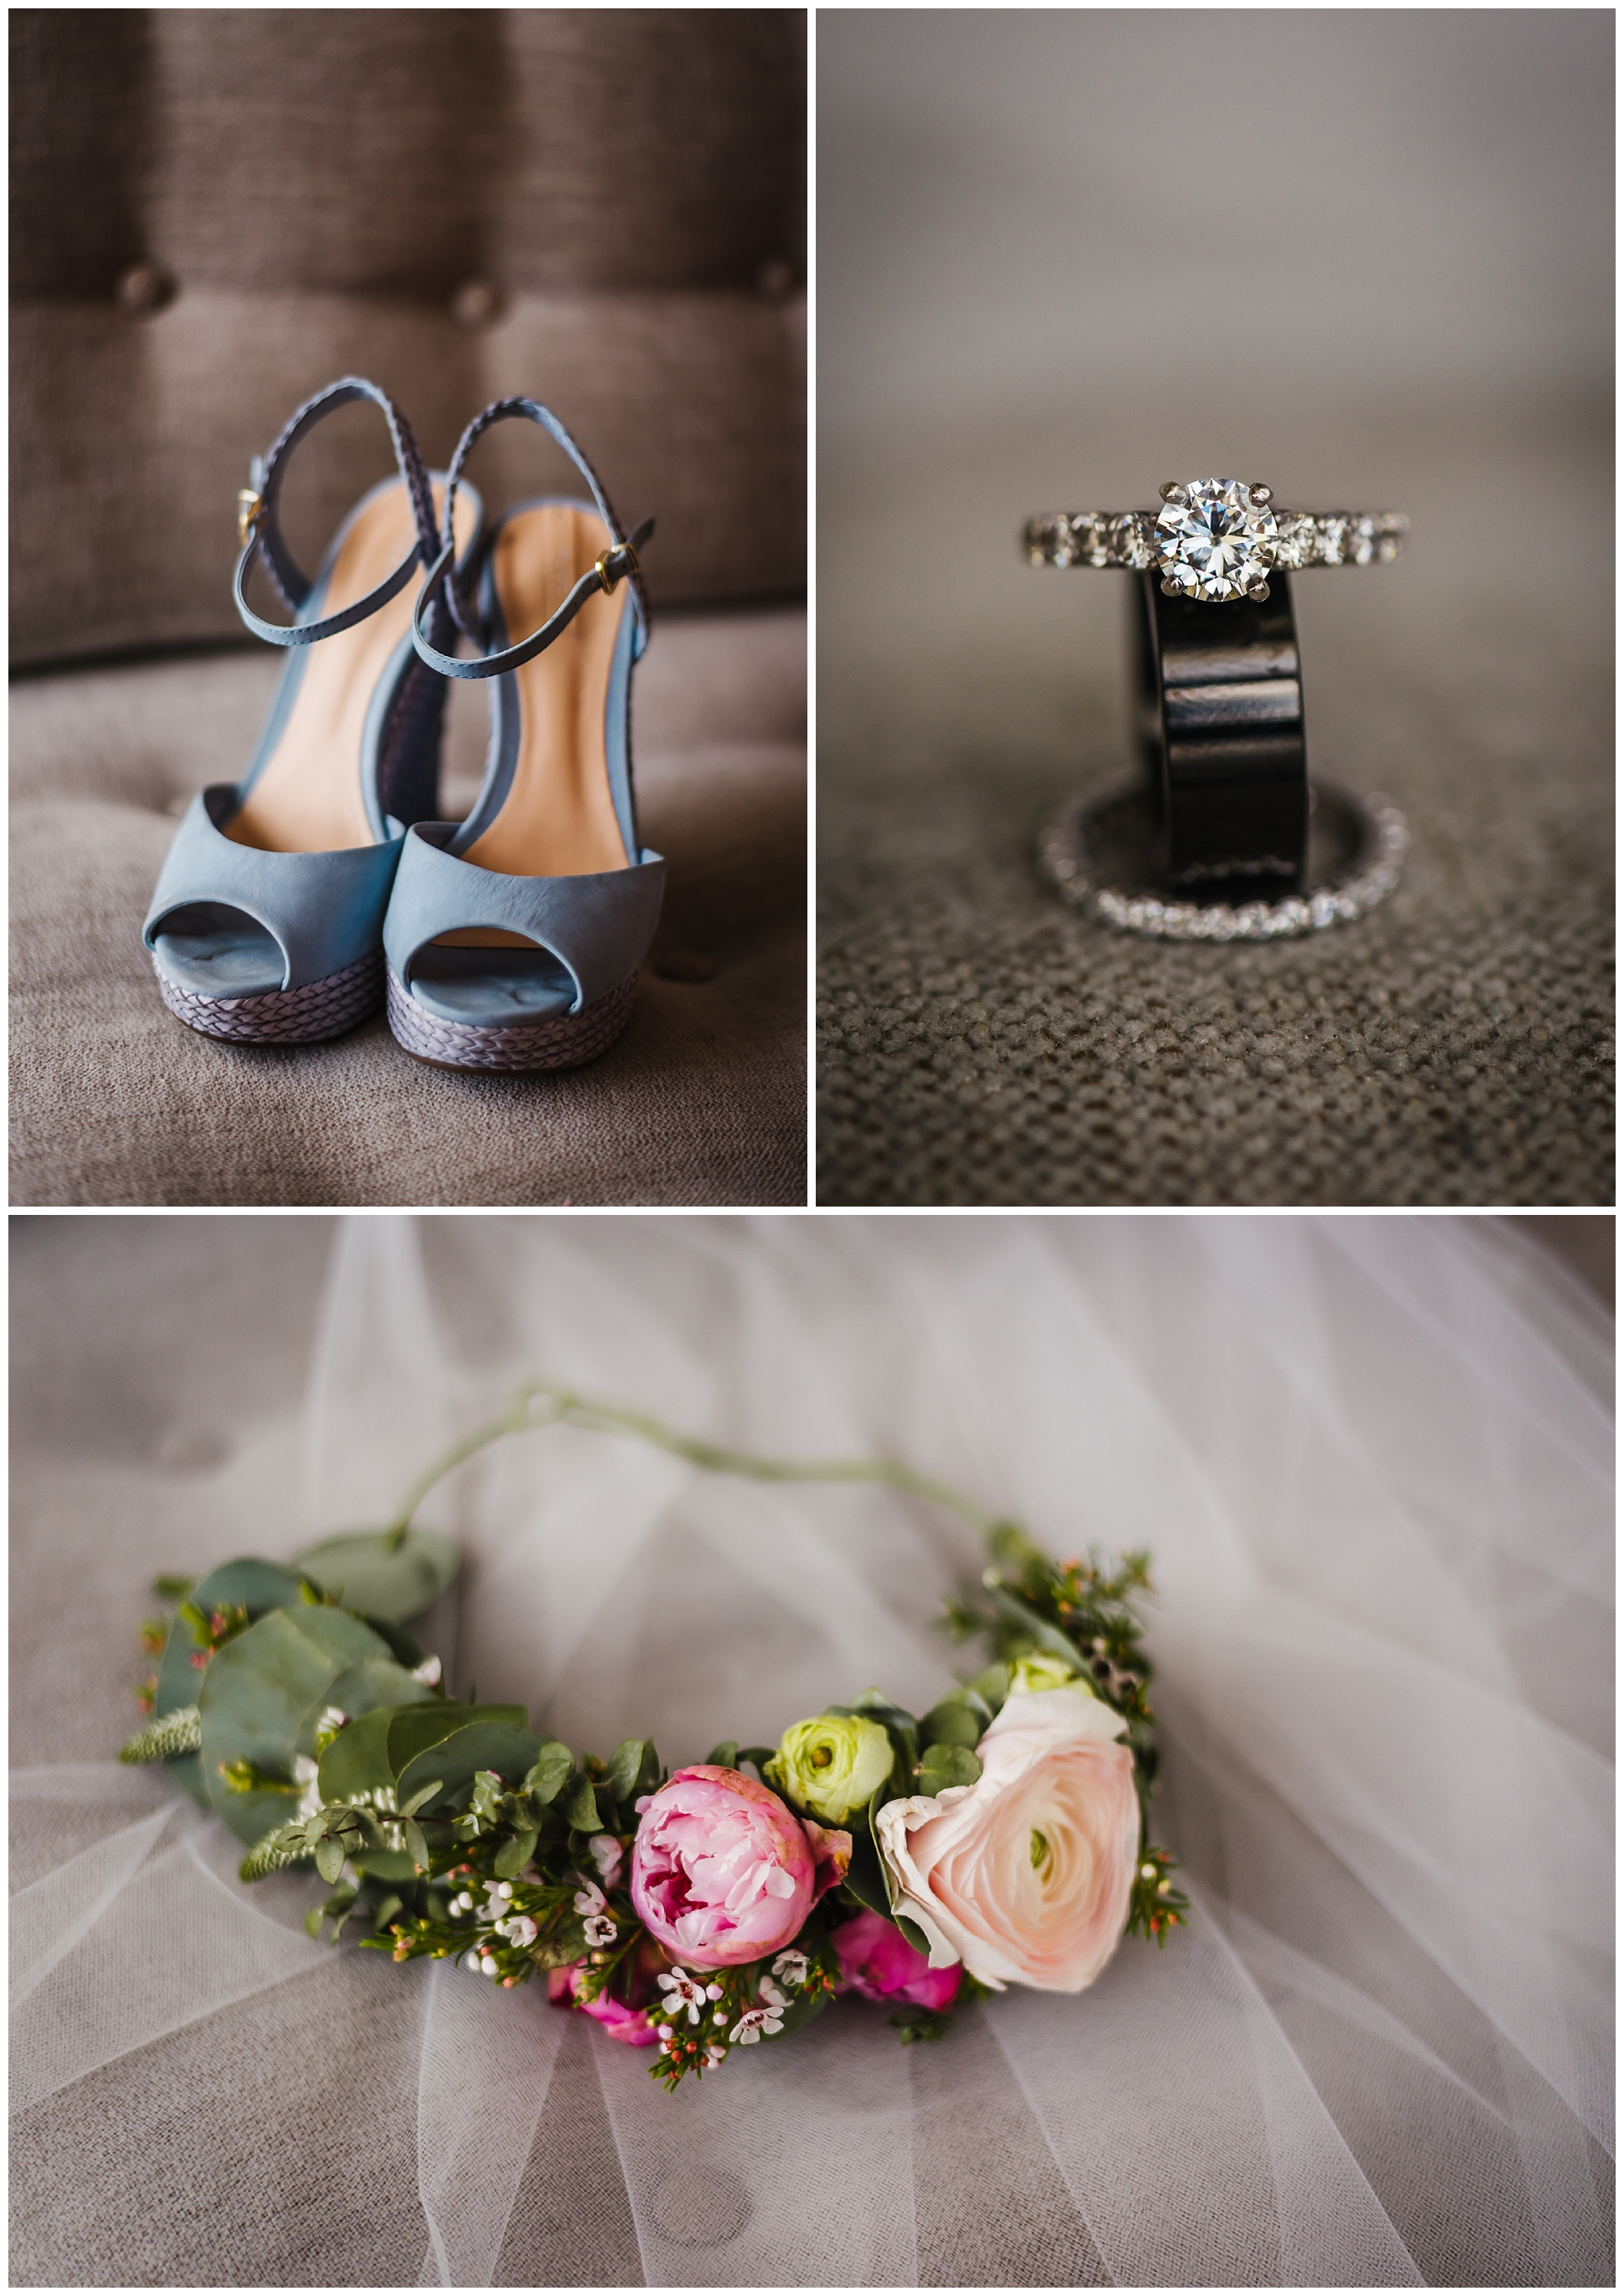 Tampa-wedding-photographer-vera-wang-flower-crown-post-card-inn_0003.jpg